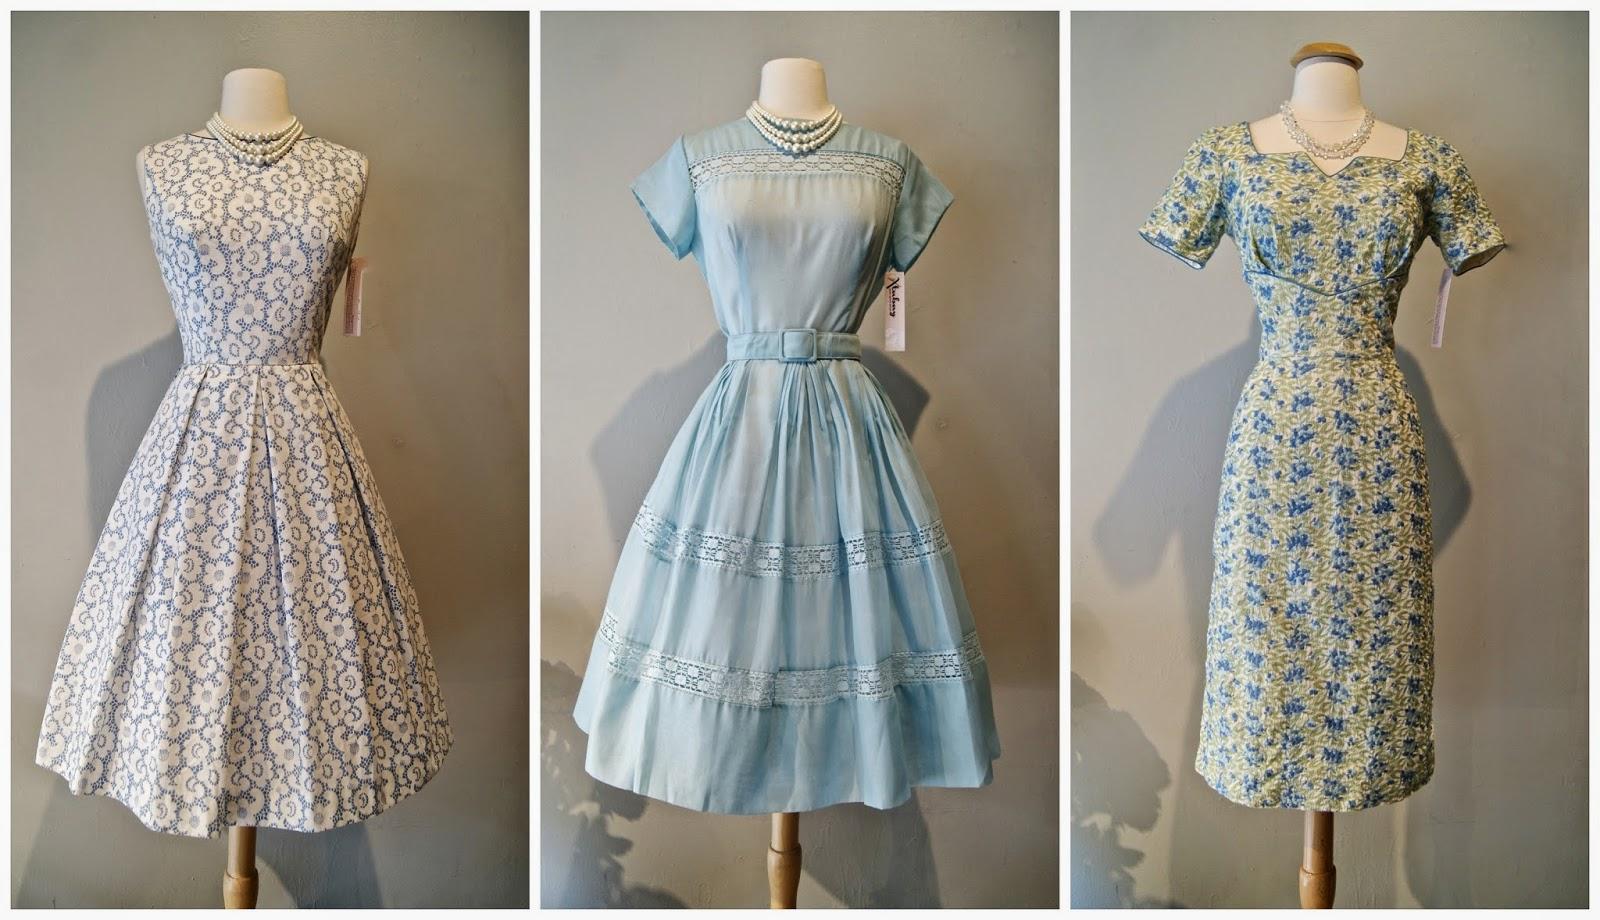 Xtabay Vintage Clothing Boutique - Portland, Oregon: June 2014